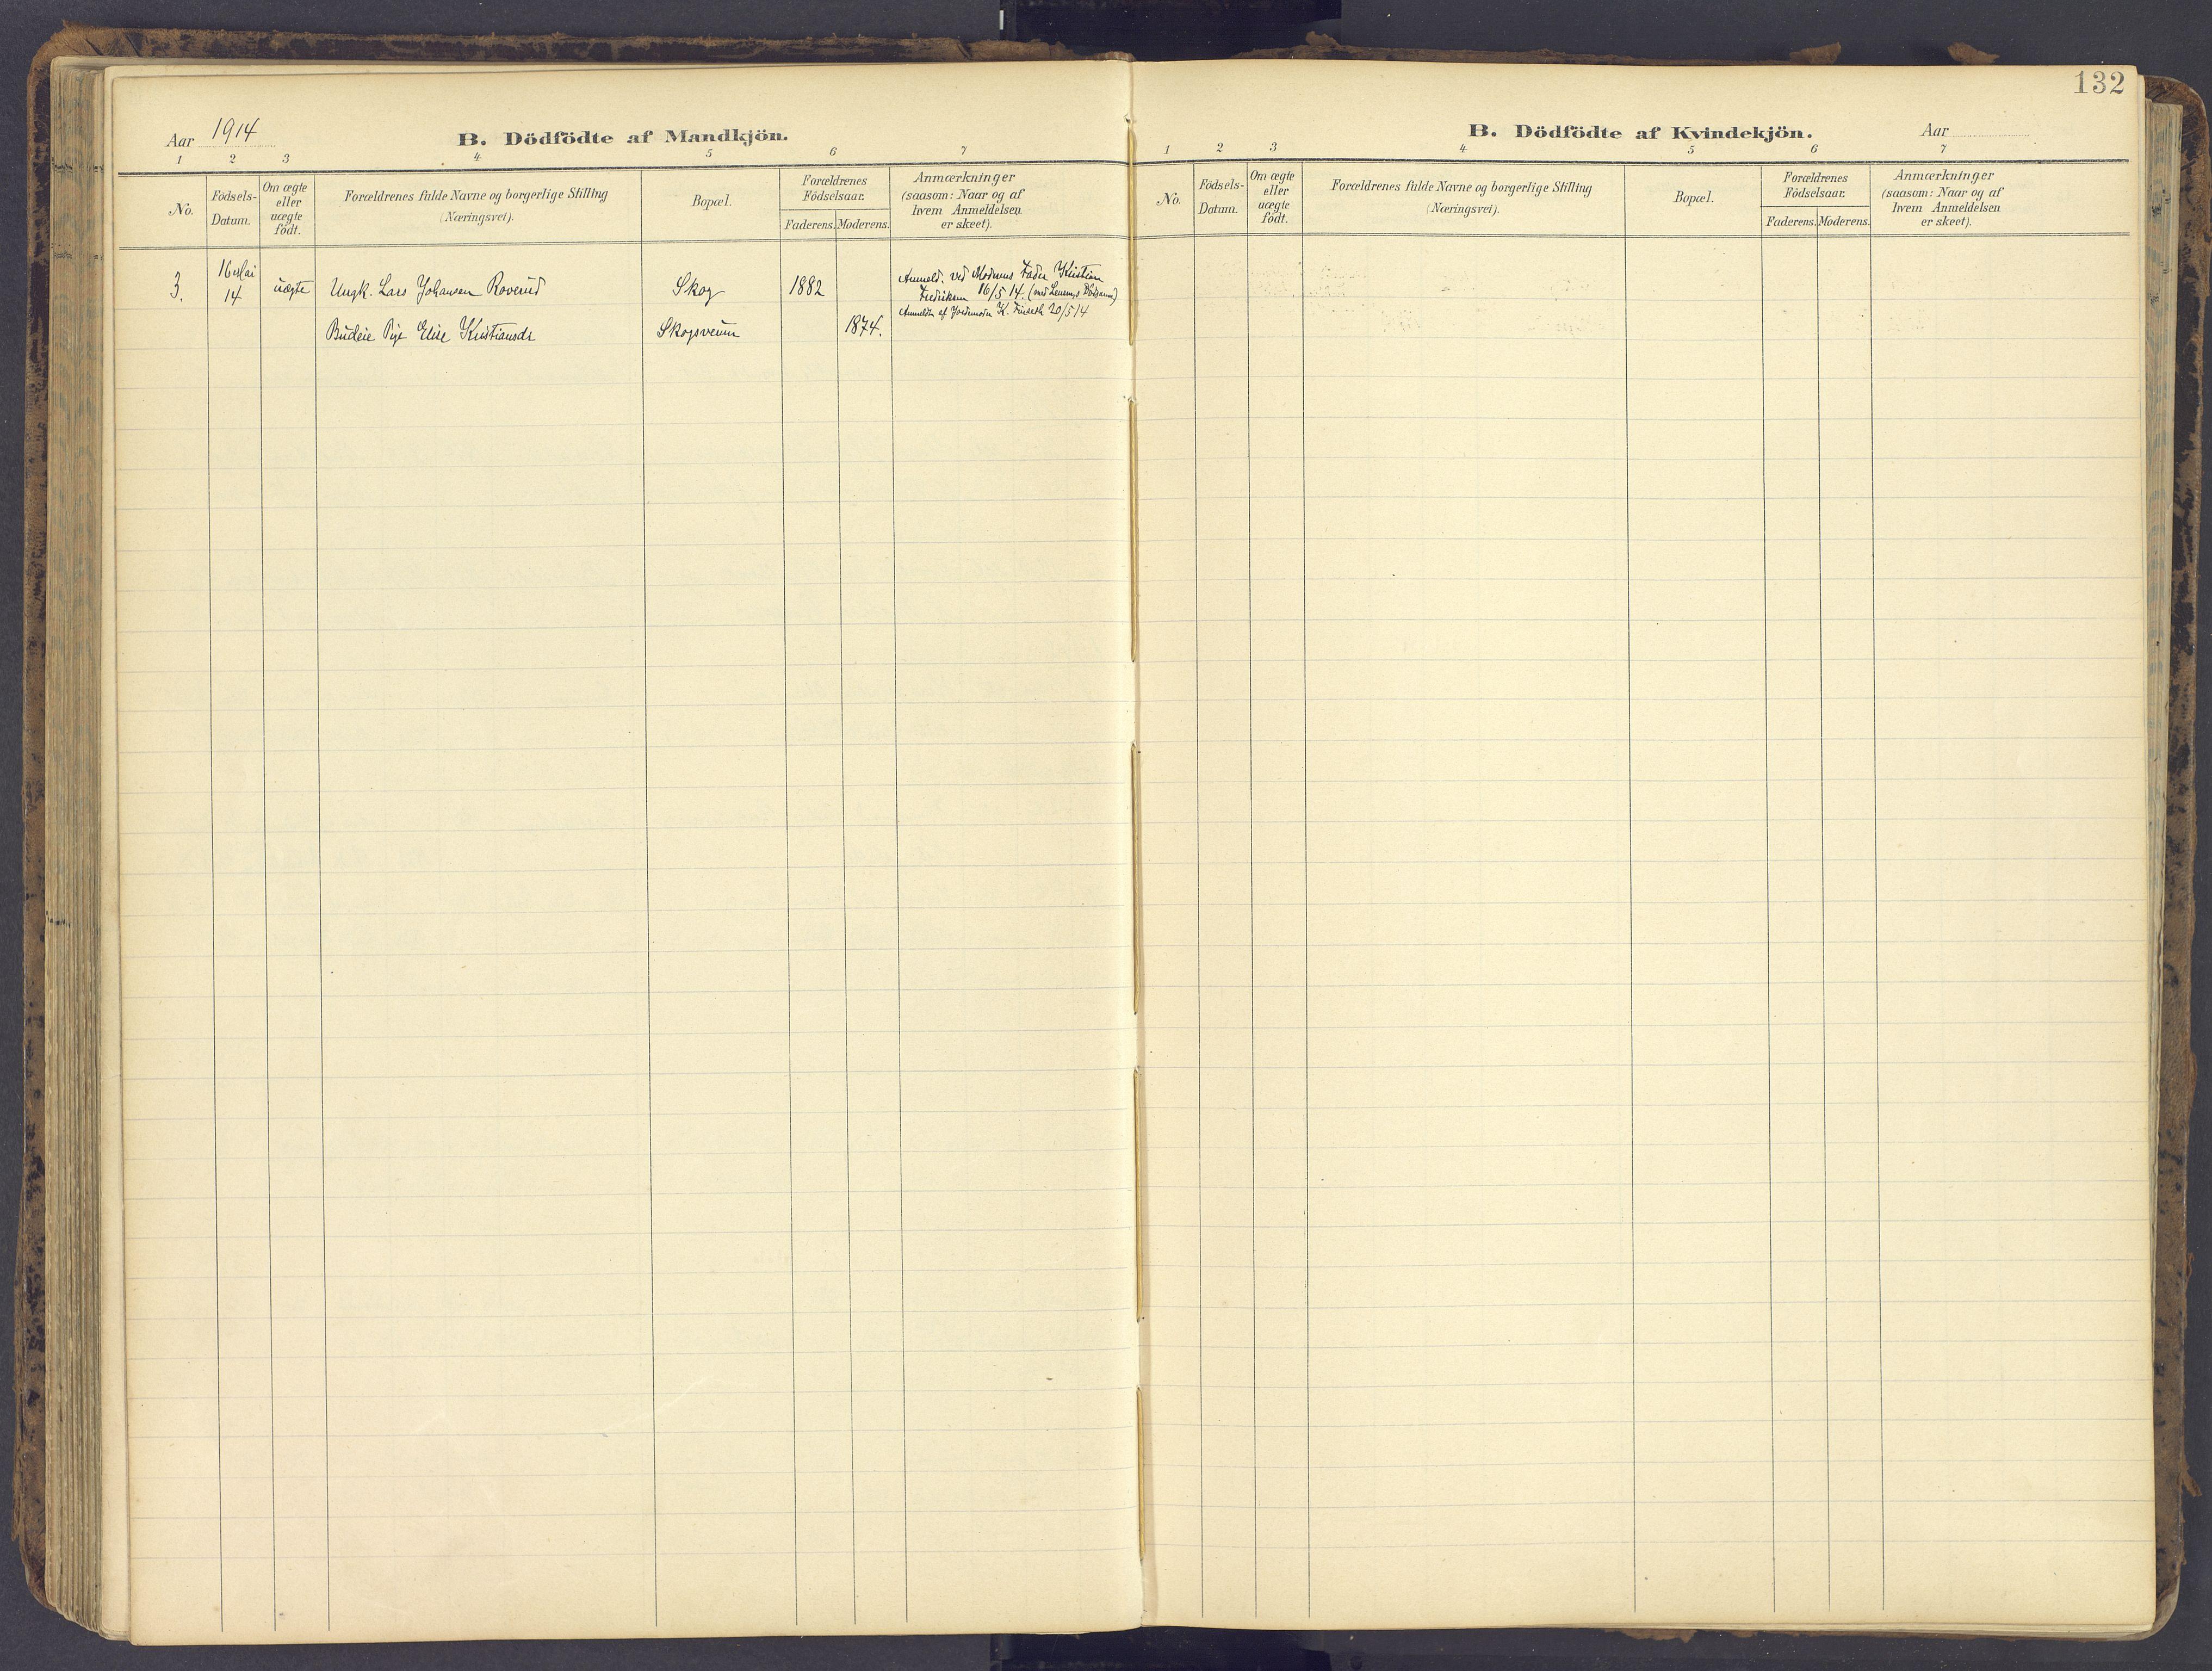 SAH, Fåberg prestekontor, Ministerialbok nr. 12, 1899-1915, s. 132